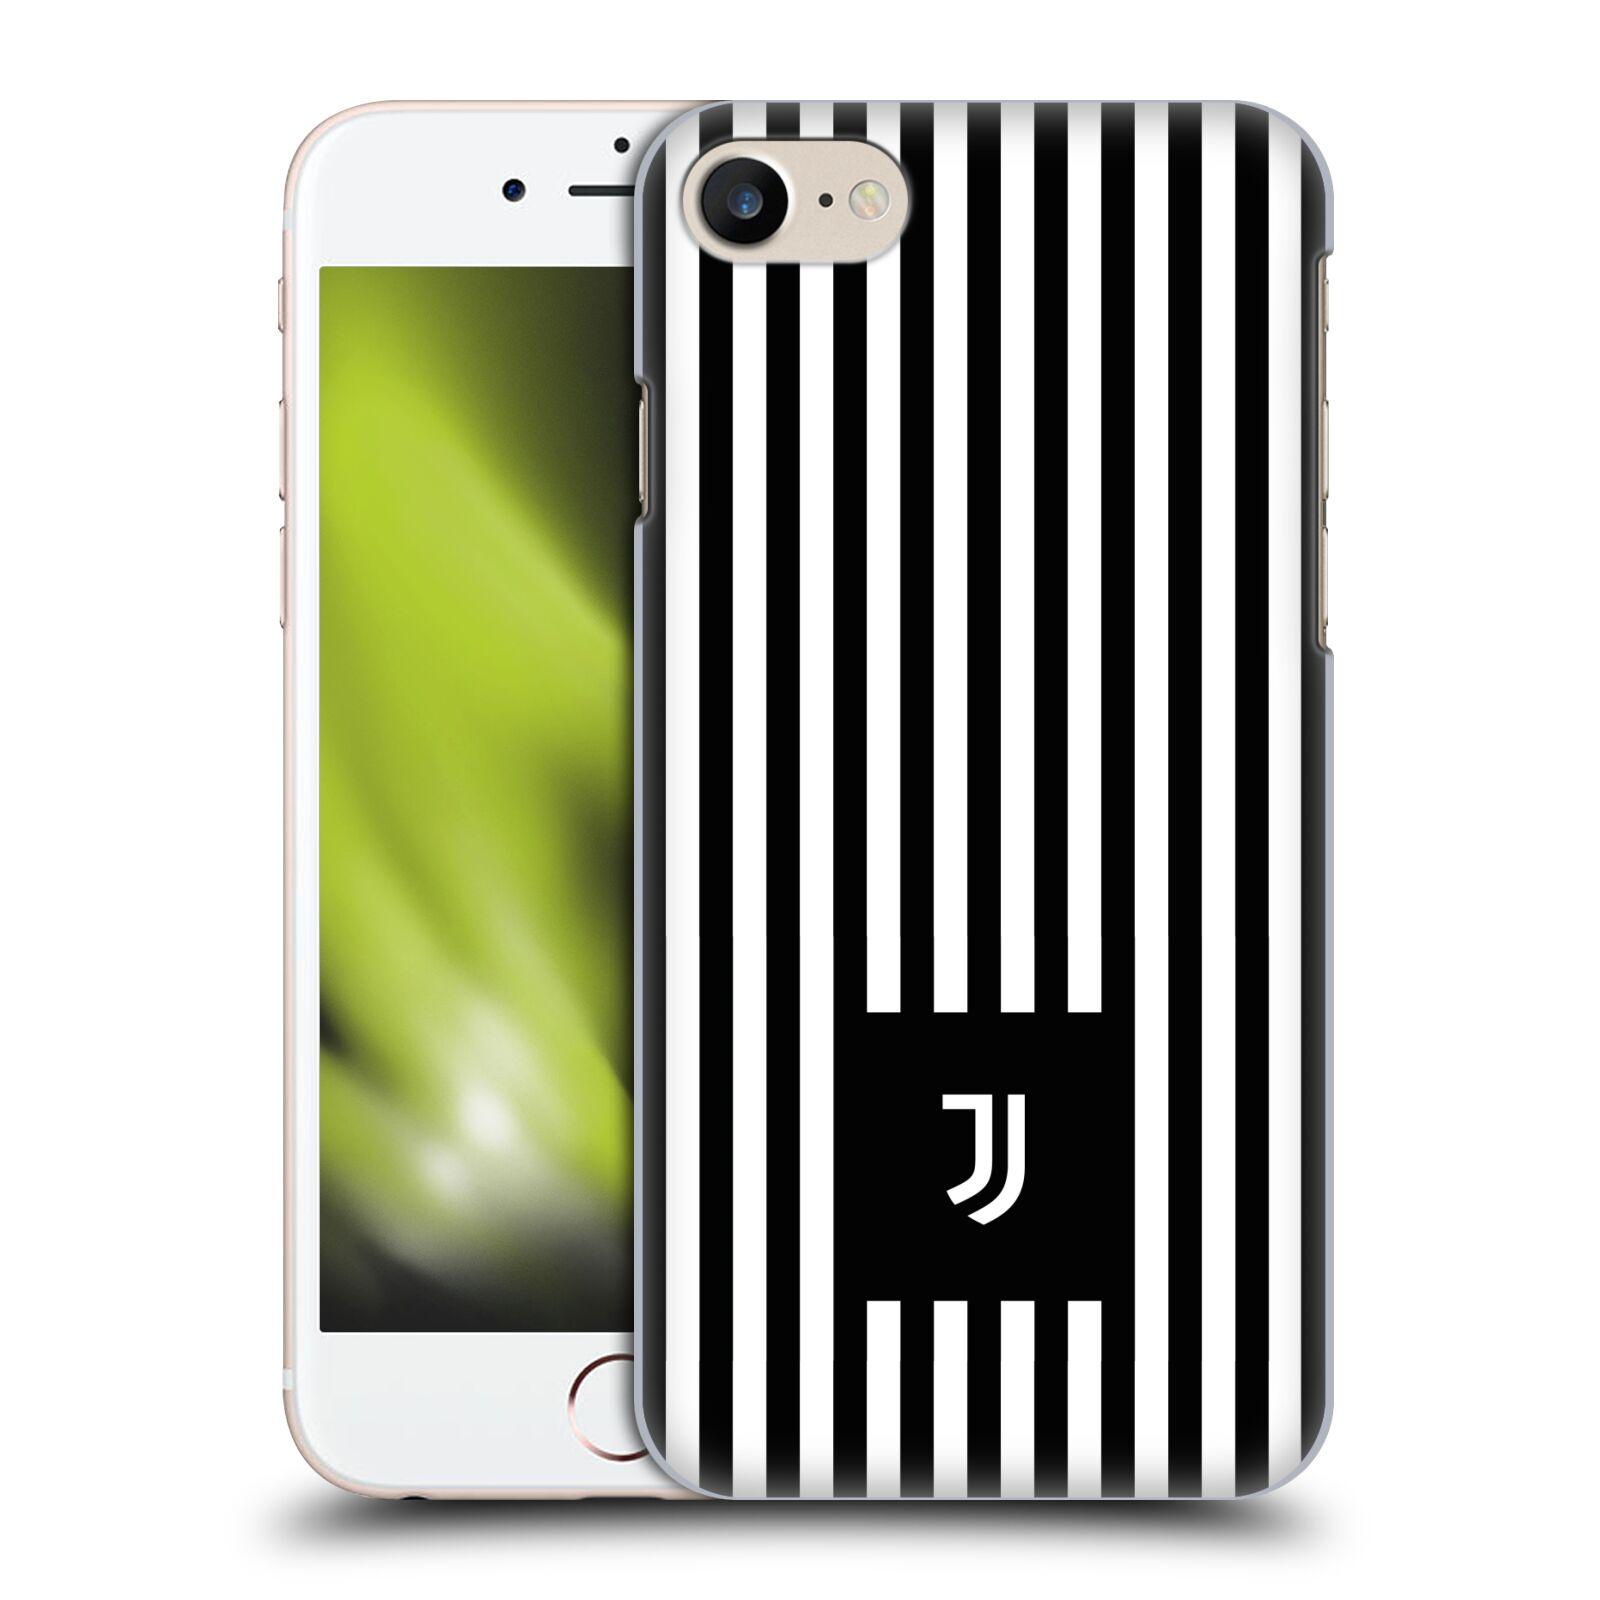 Plastové pouzdro na mobil Apple iPhone SE (2020) - Head Case - Juventus FC - Nové logo - Pruhy